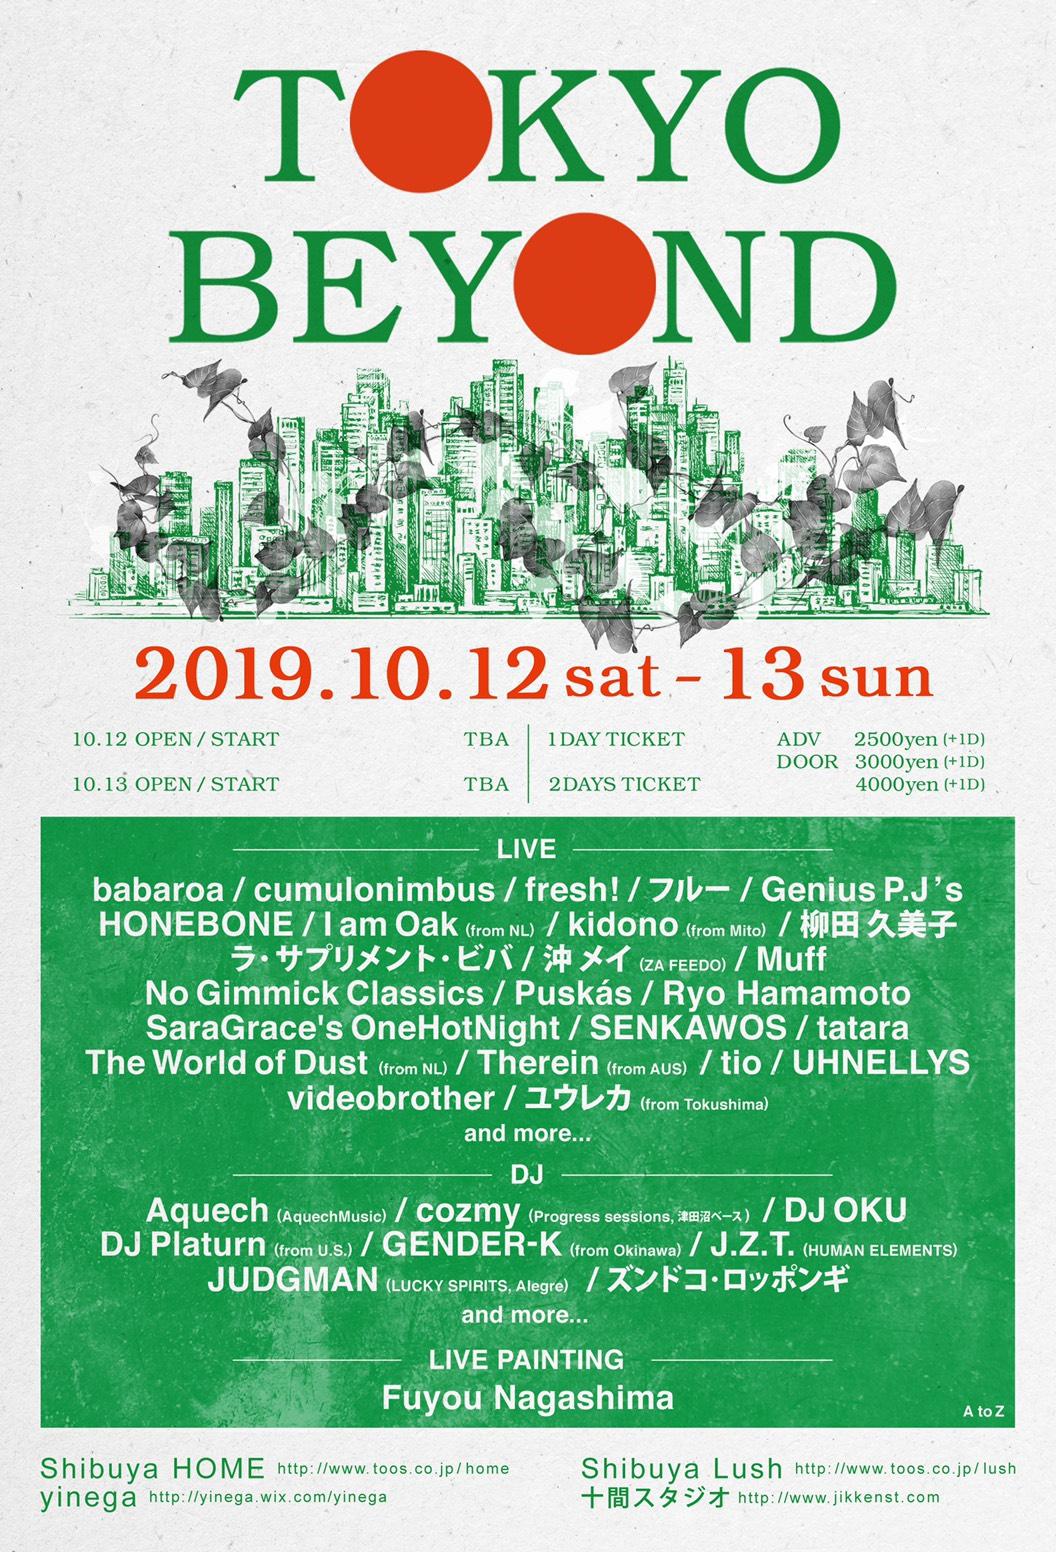 20191012_TOKYOBEYOND_08